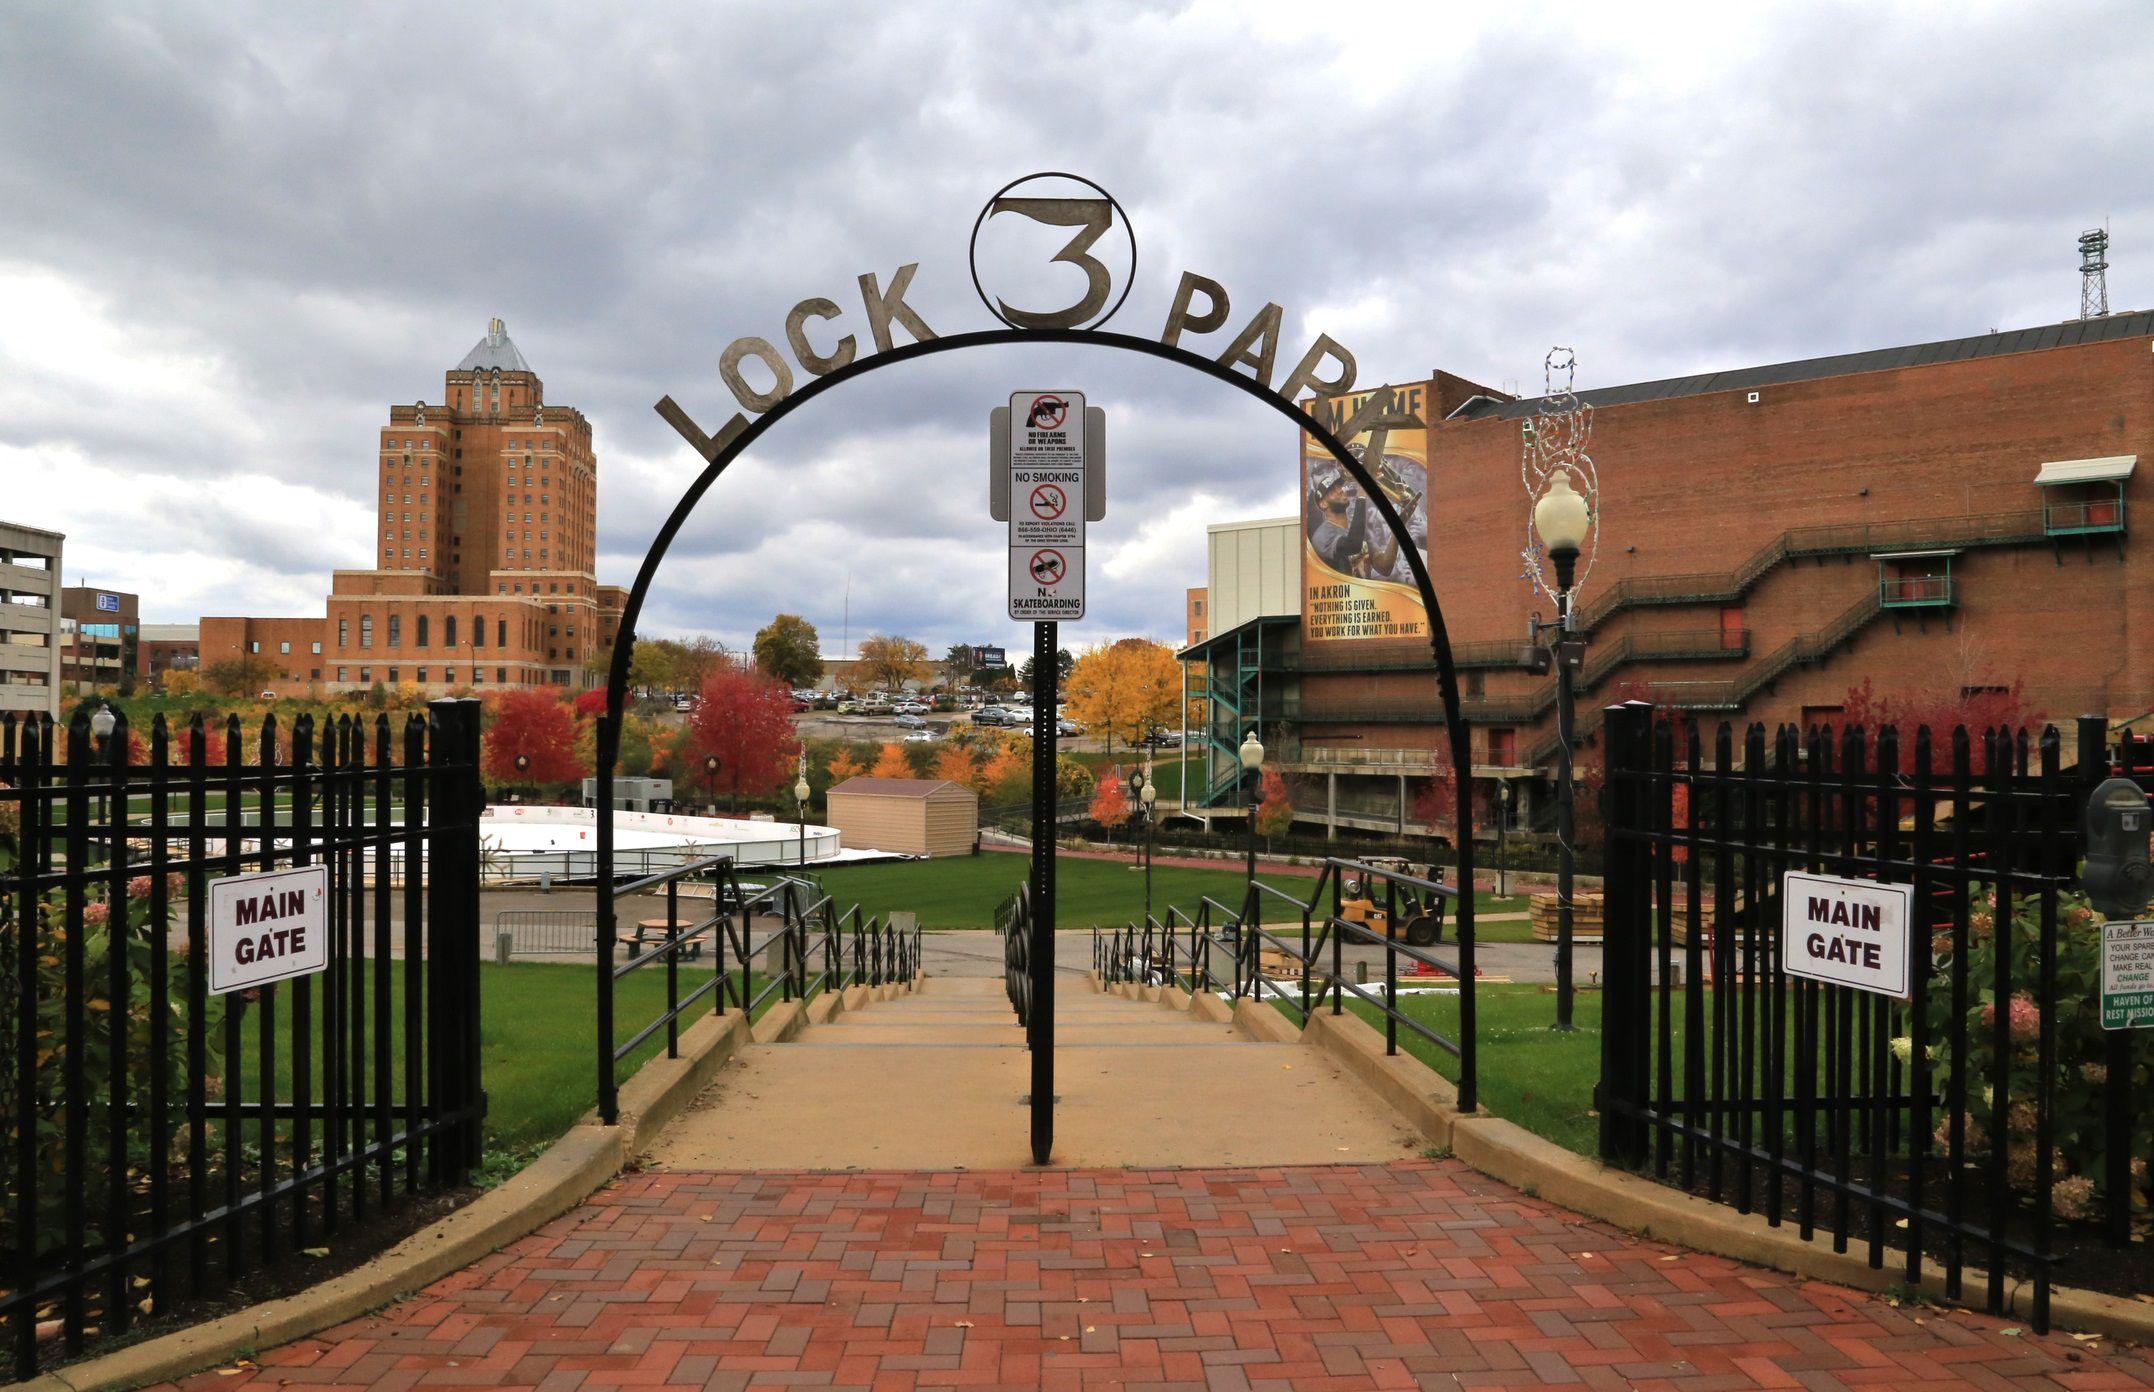 Profile Of Lock 3 Park In Akron Ohio